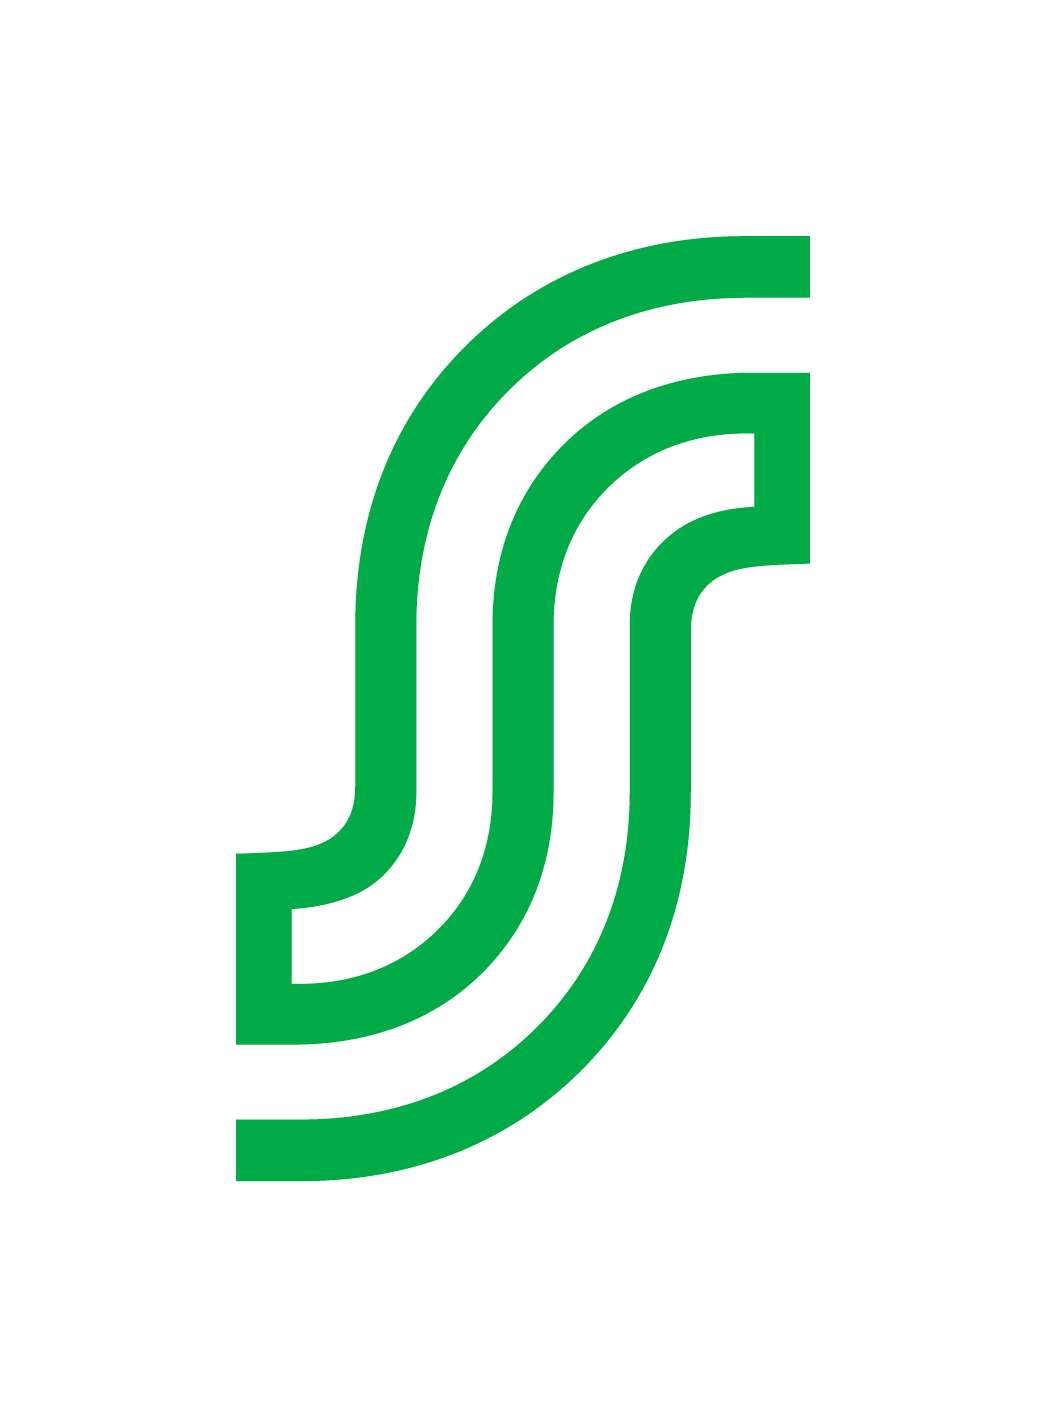 SUUR-SEUDUN OSUUSKAUPPA SSO logo